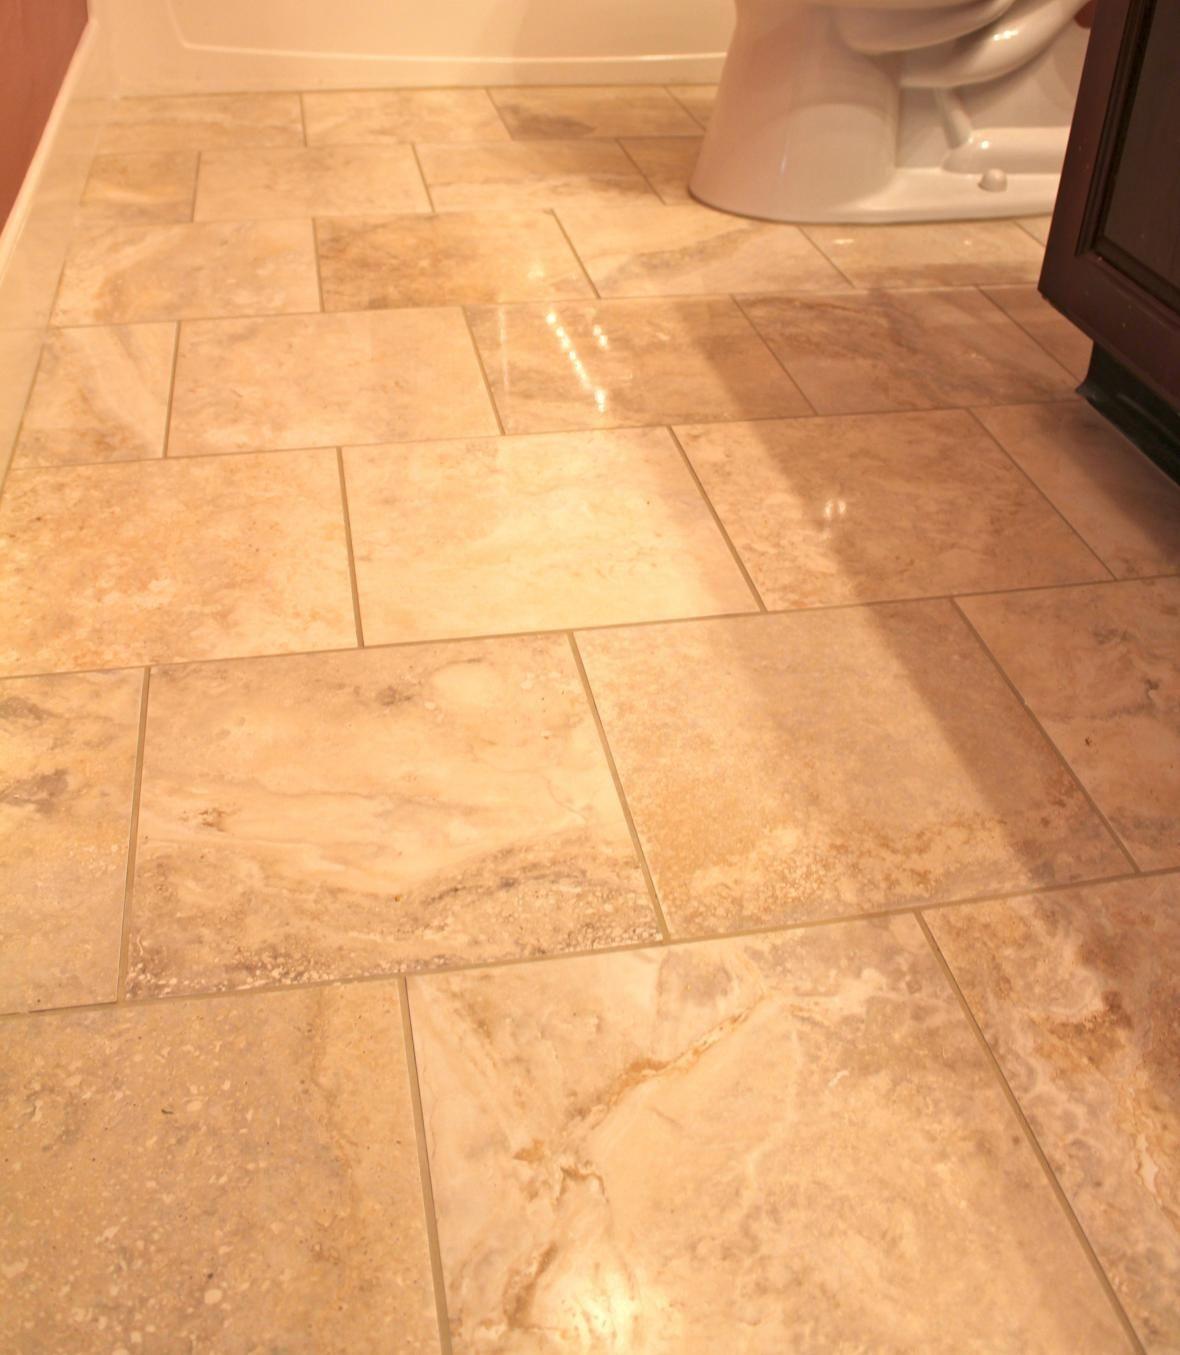 Non slip ceramic floor tiles for bathroom bathroom exclusiv non slip ceramic floor tiles for bathroom dailygadgetfo Gallery